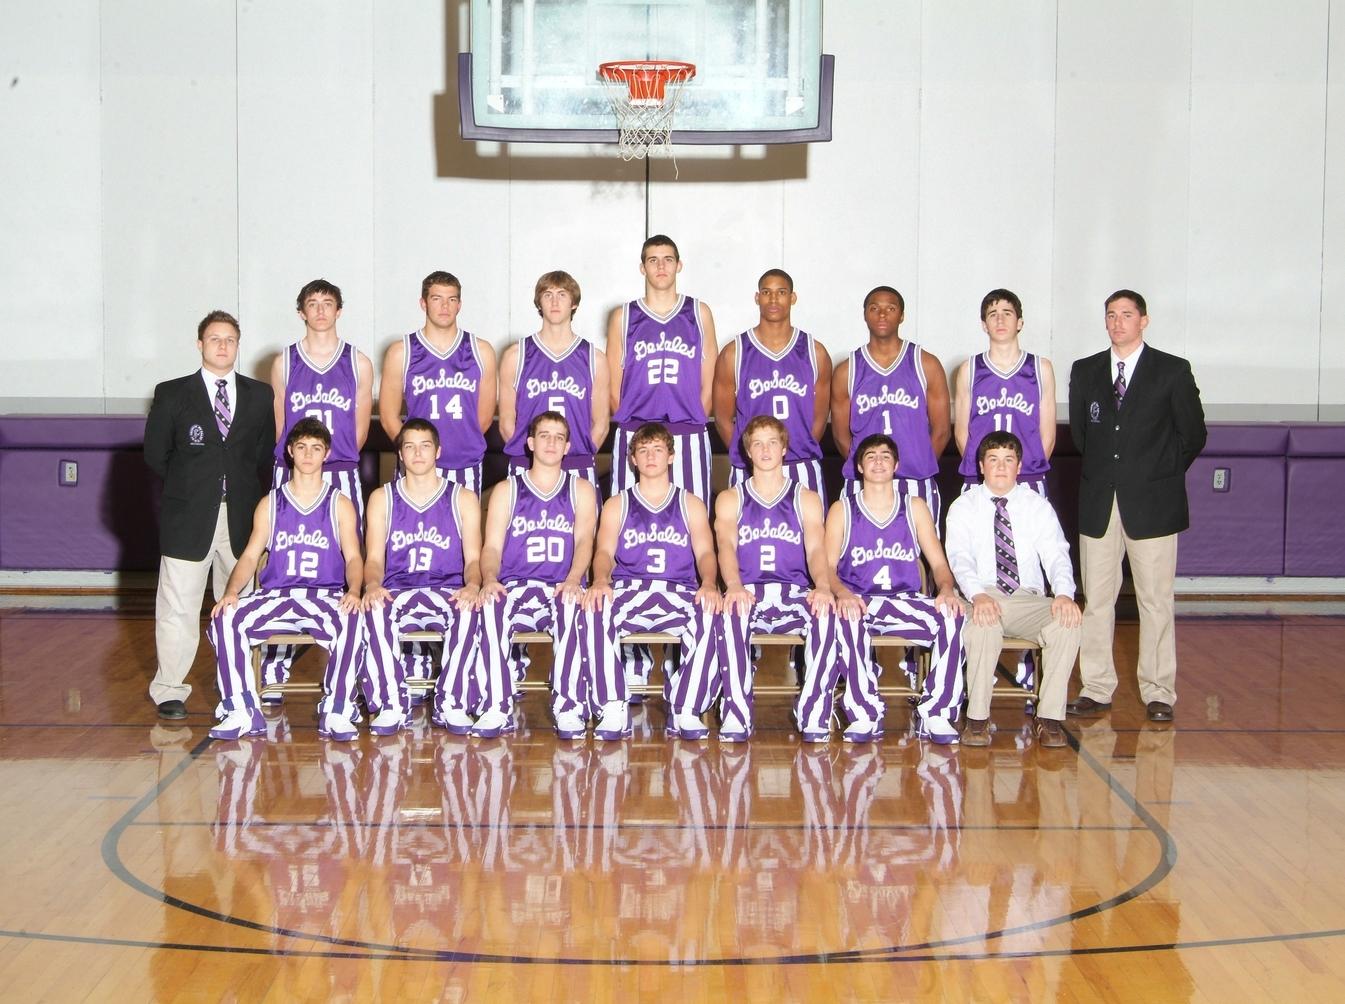 2006 Regional Champions